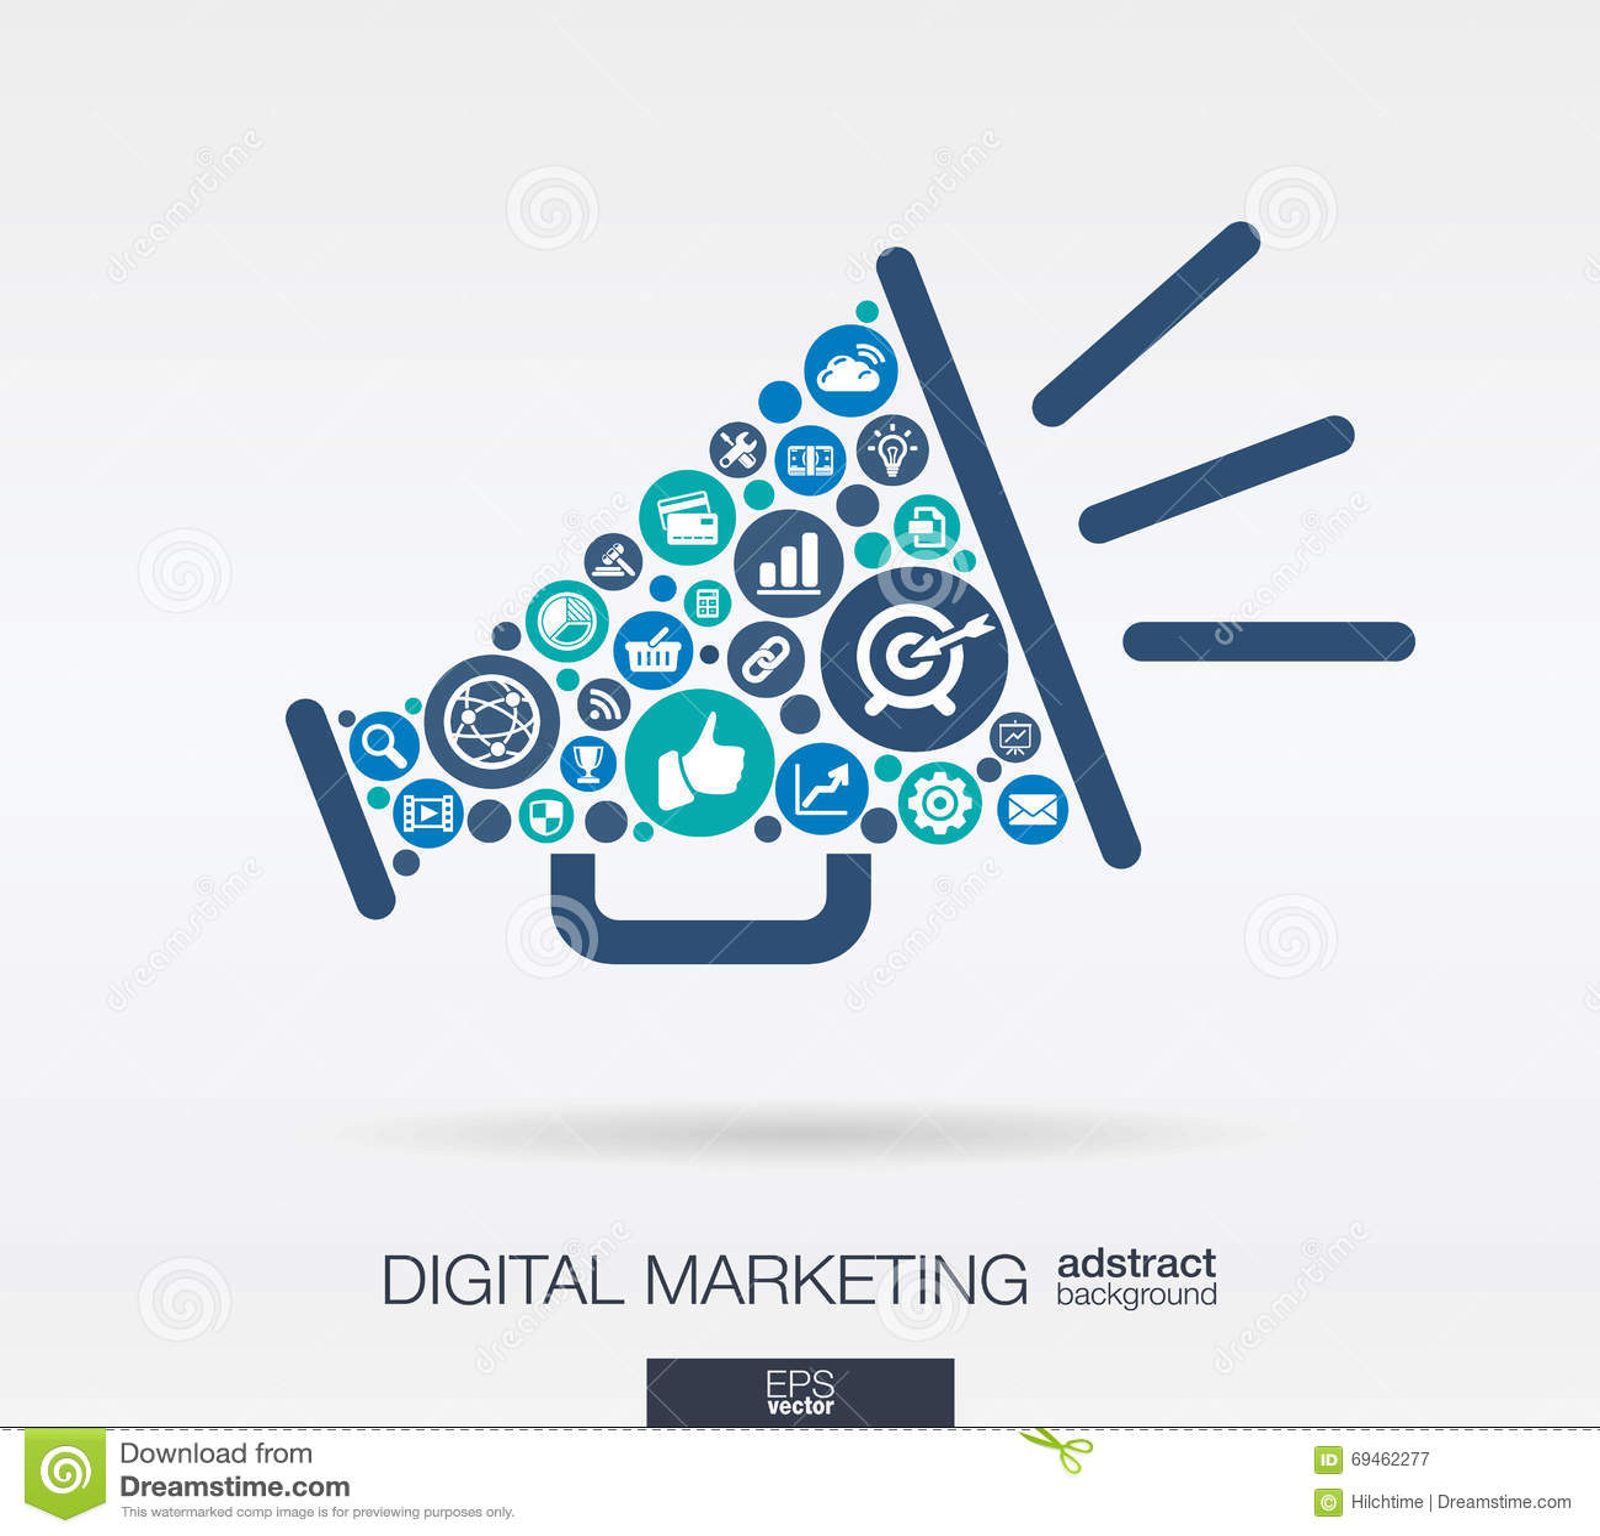 Flat icons in a speaker shape, digital marketing, social media, network, computer concept